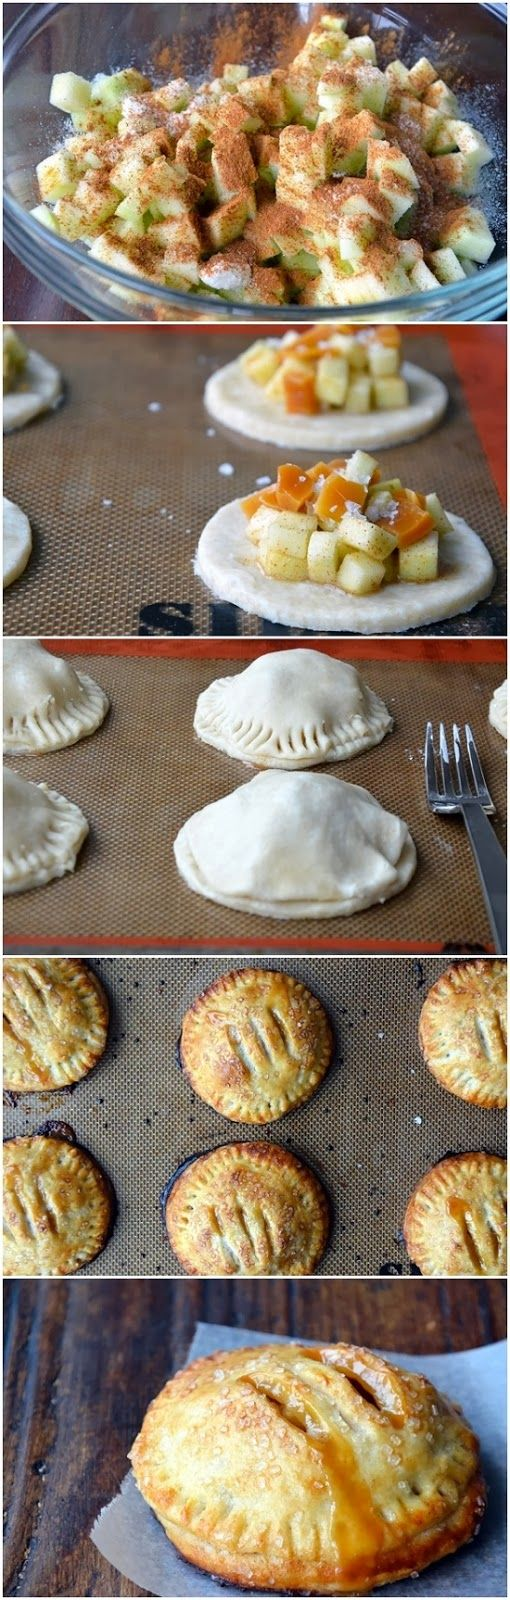 Focuseat: Salted Caramel Apple Hand Pies Recipe